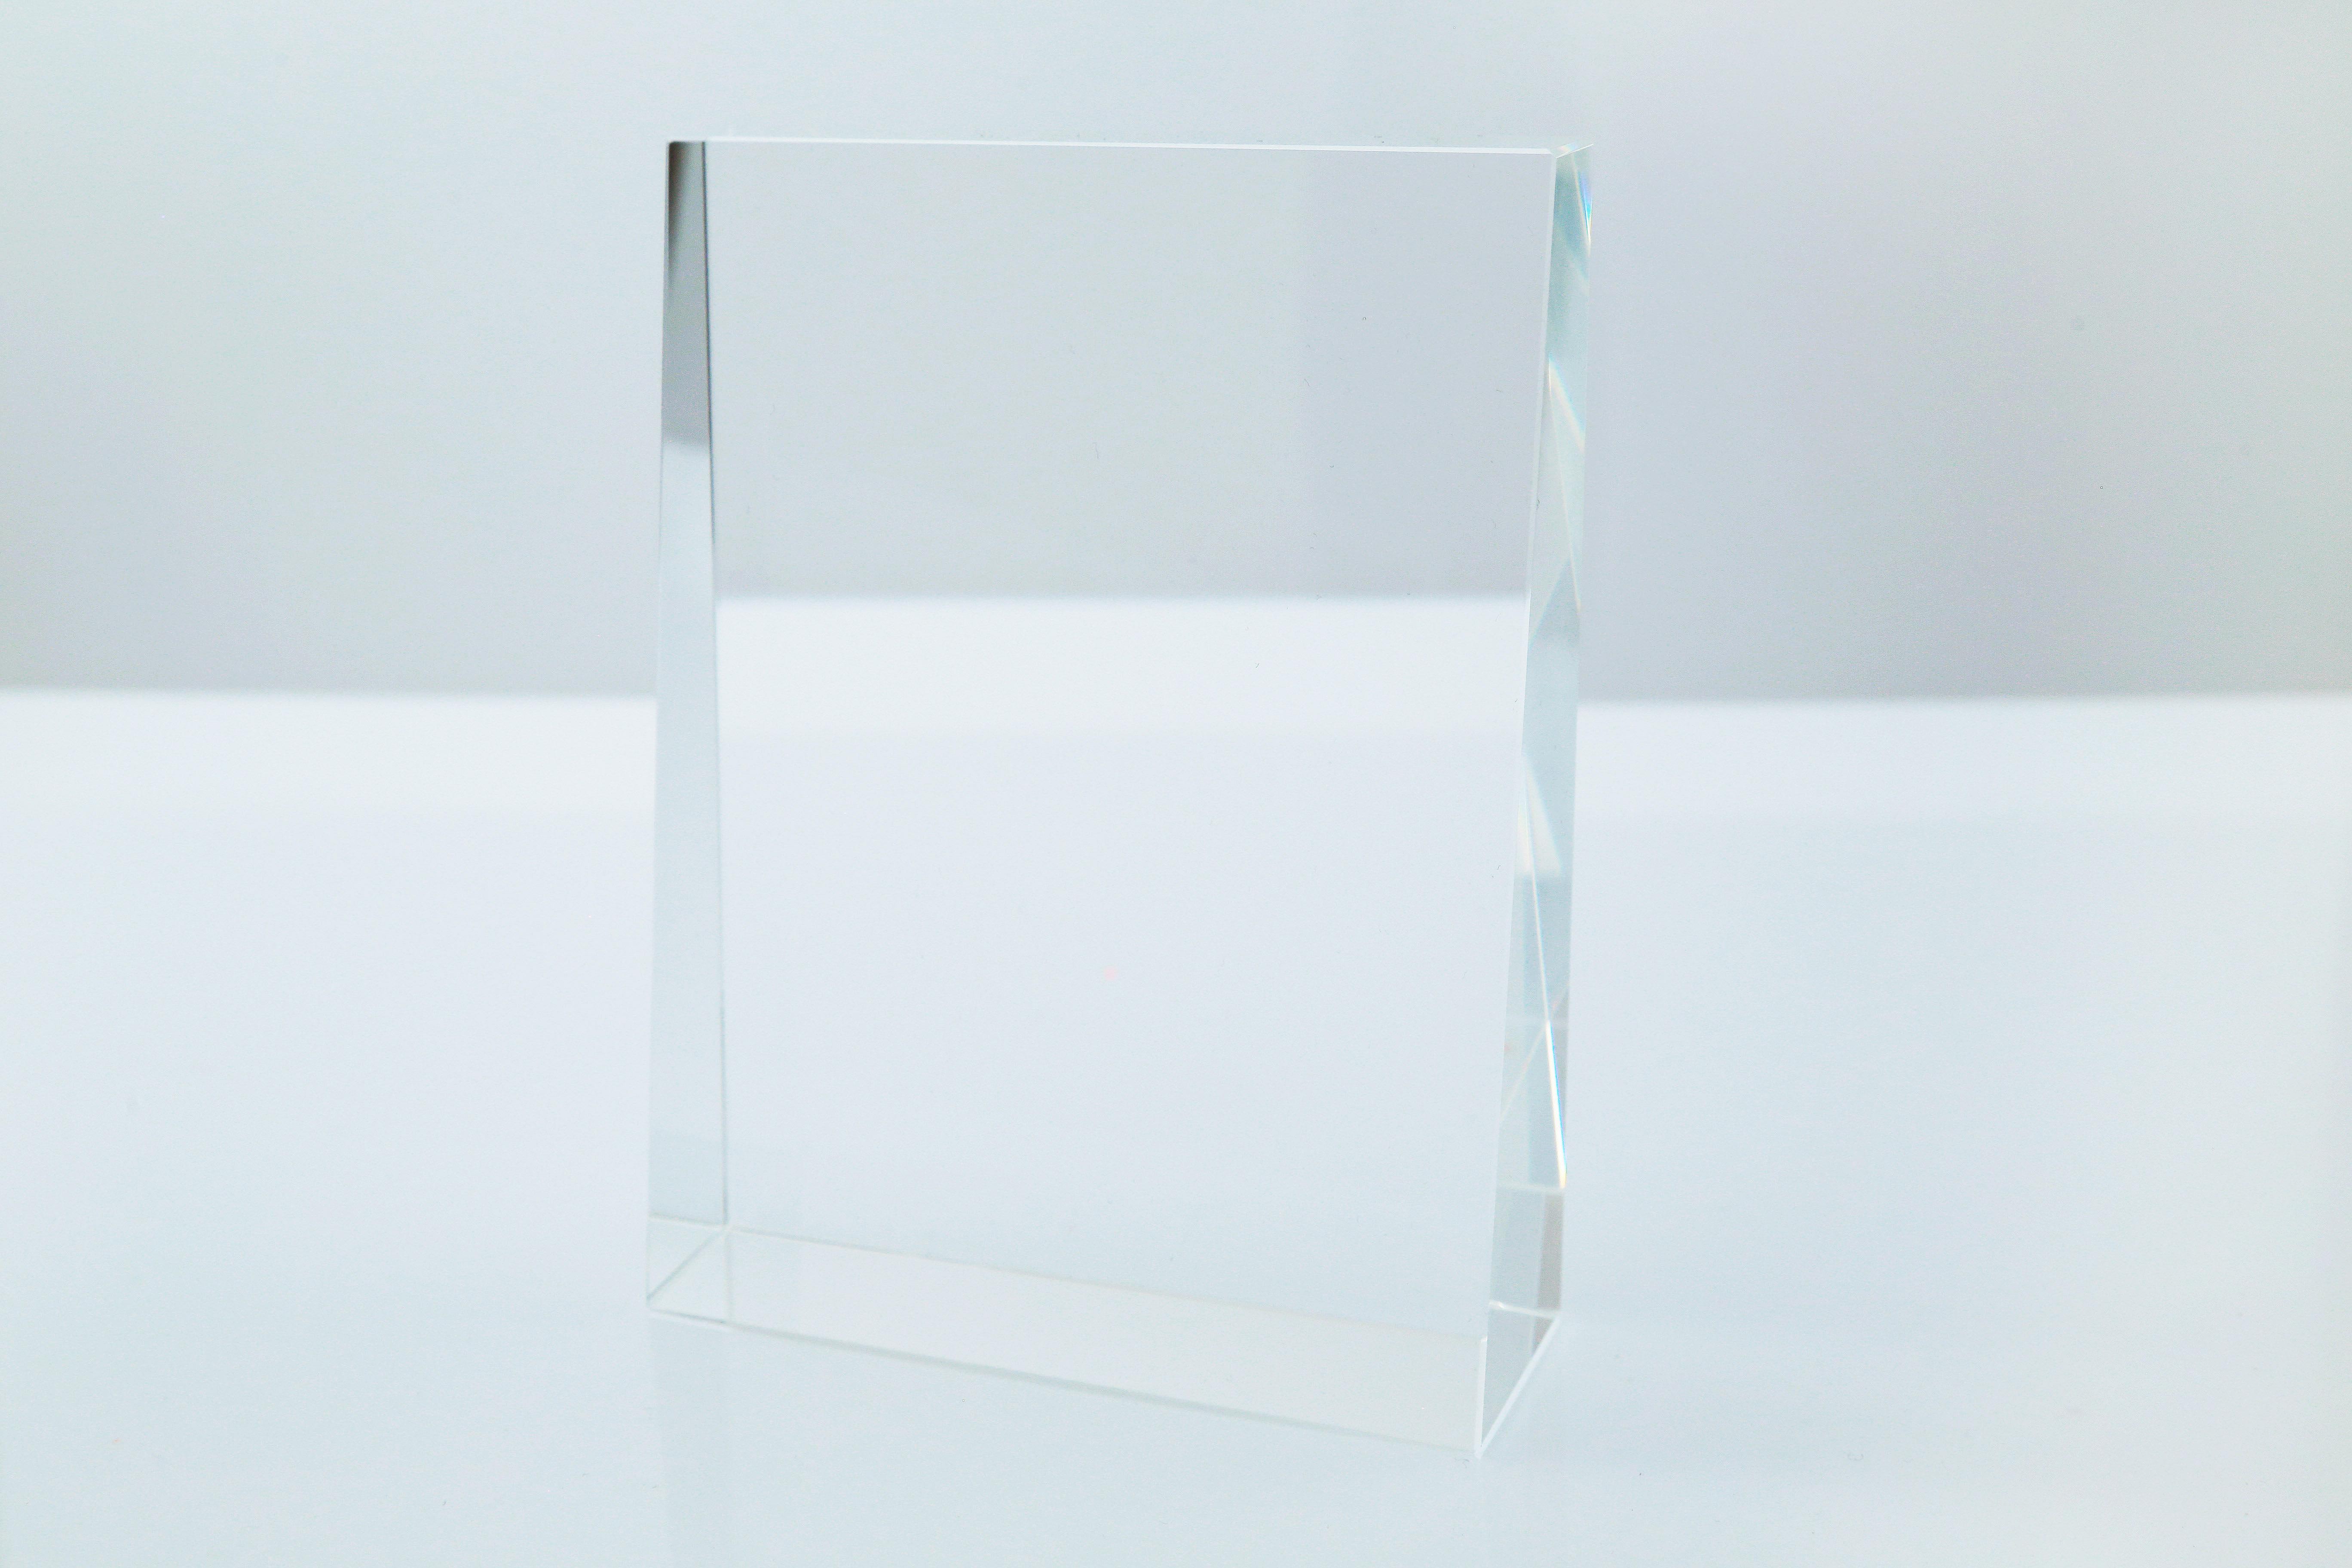 Muncy » Glass form 2D objects